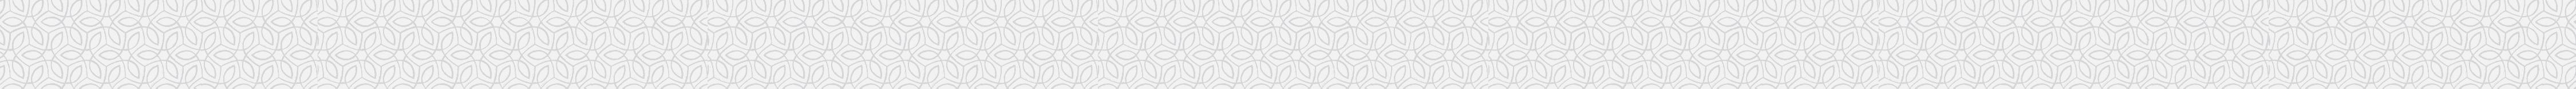 Texture_Above Blog_4500x155_sm